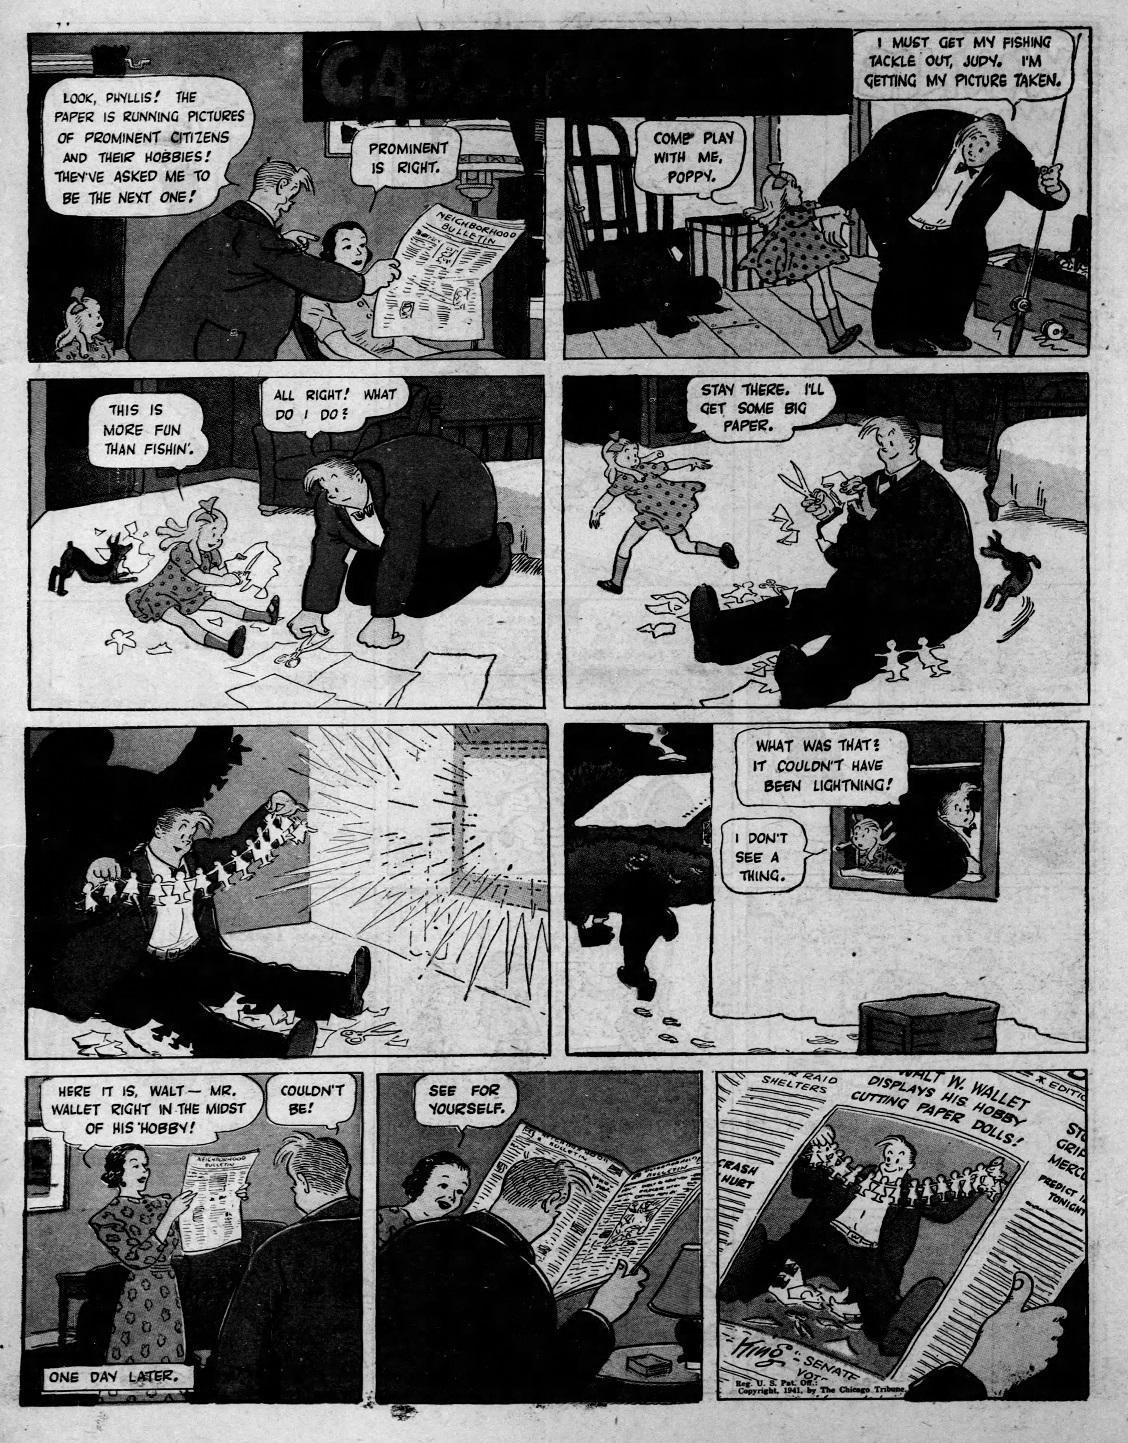 Daily_News_Sun__Jan_19__1941_(7).jpg